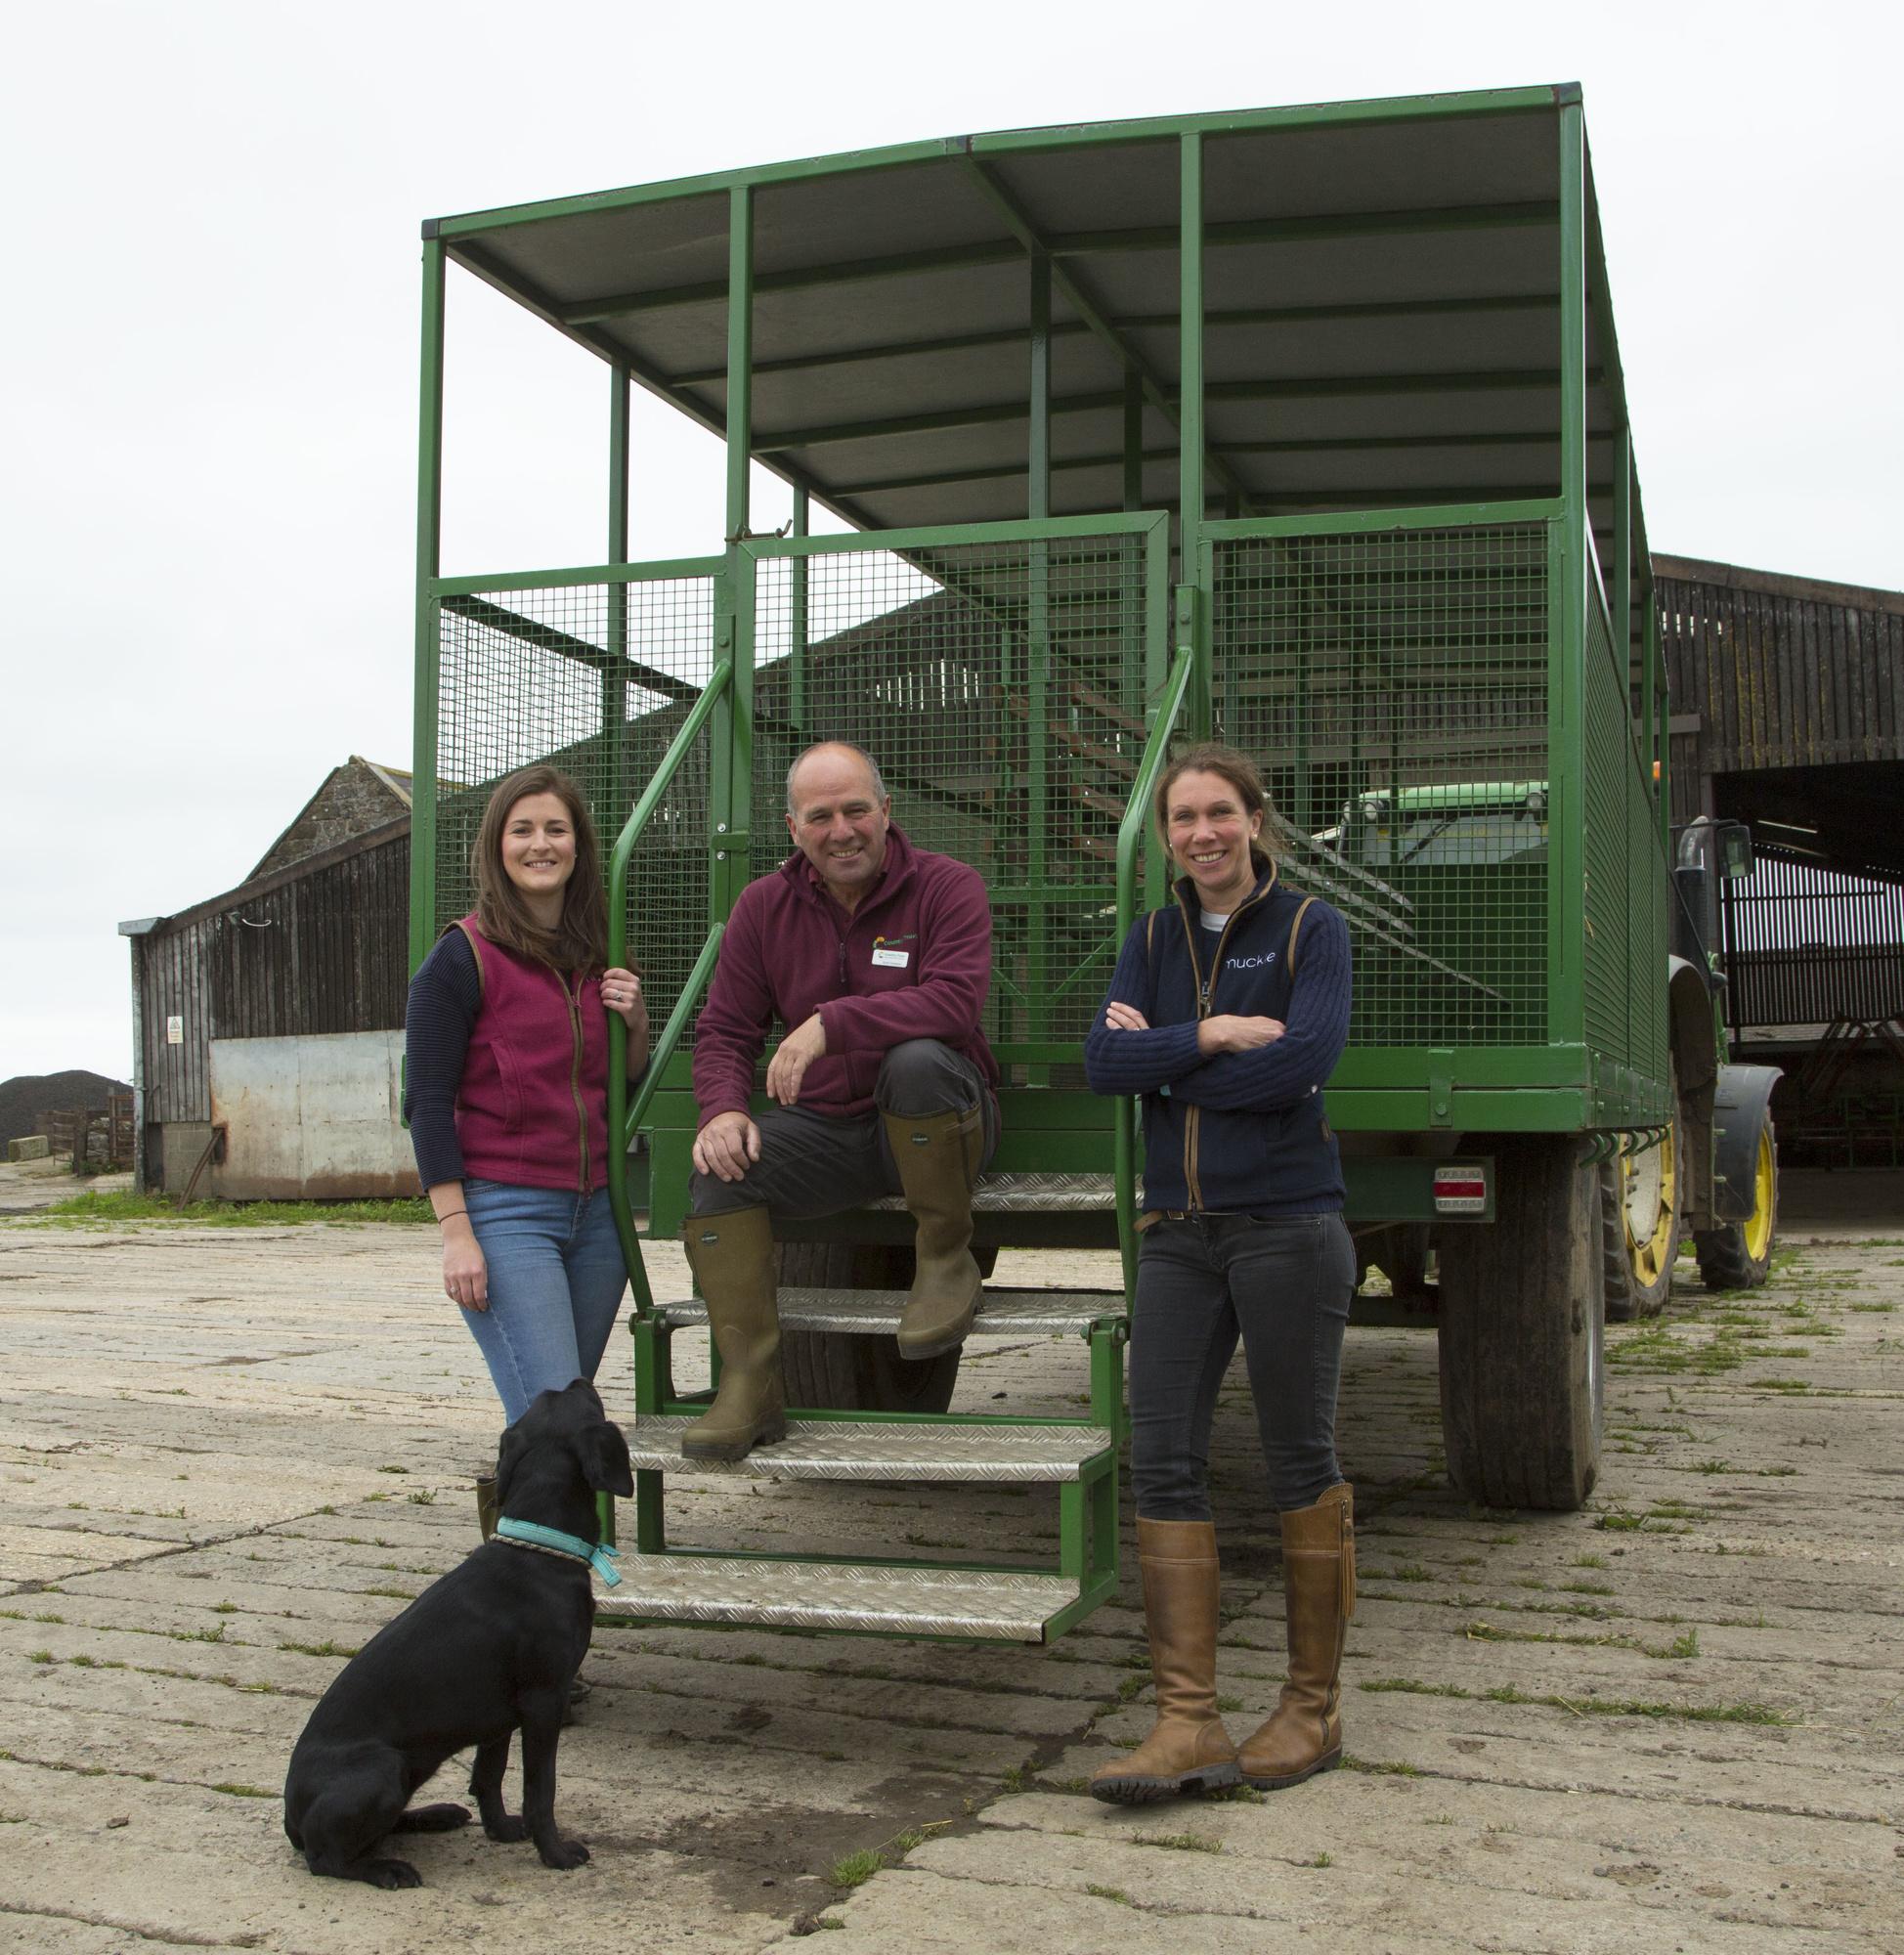 Broxfield Farm school visit: Beth Thomspn, David Thompson (The Country Trust) and Elizabeth Earle